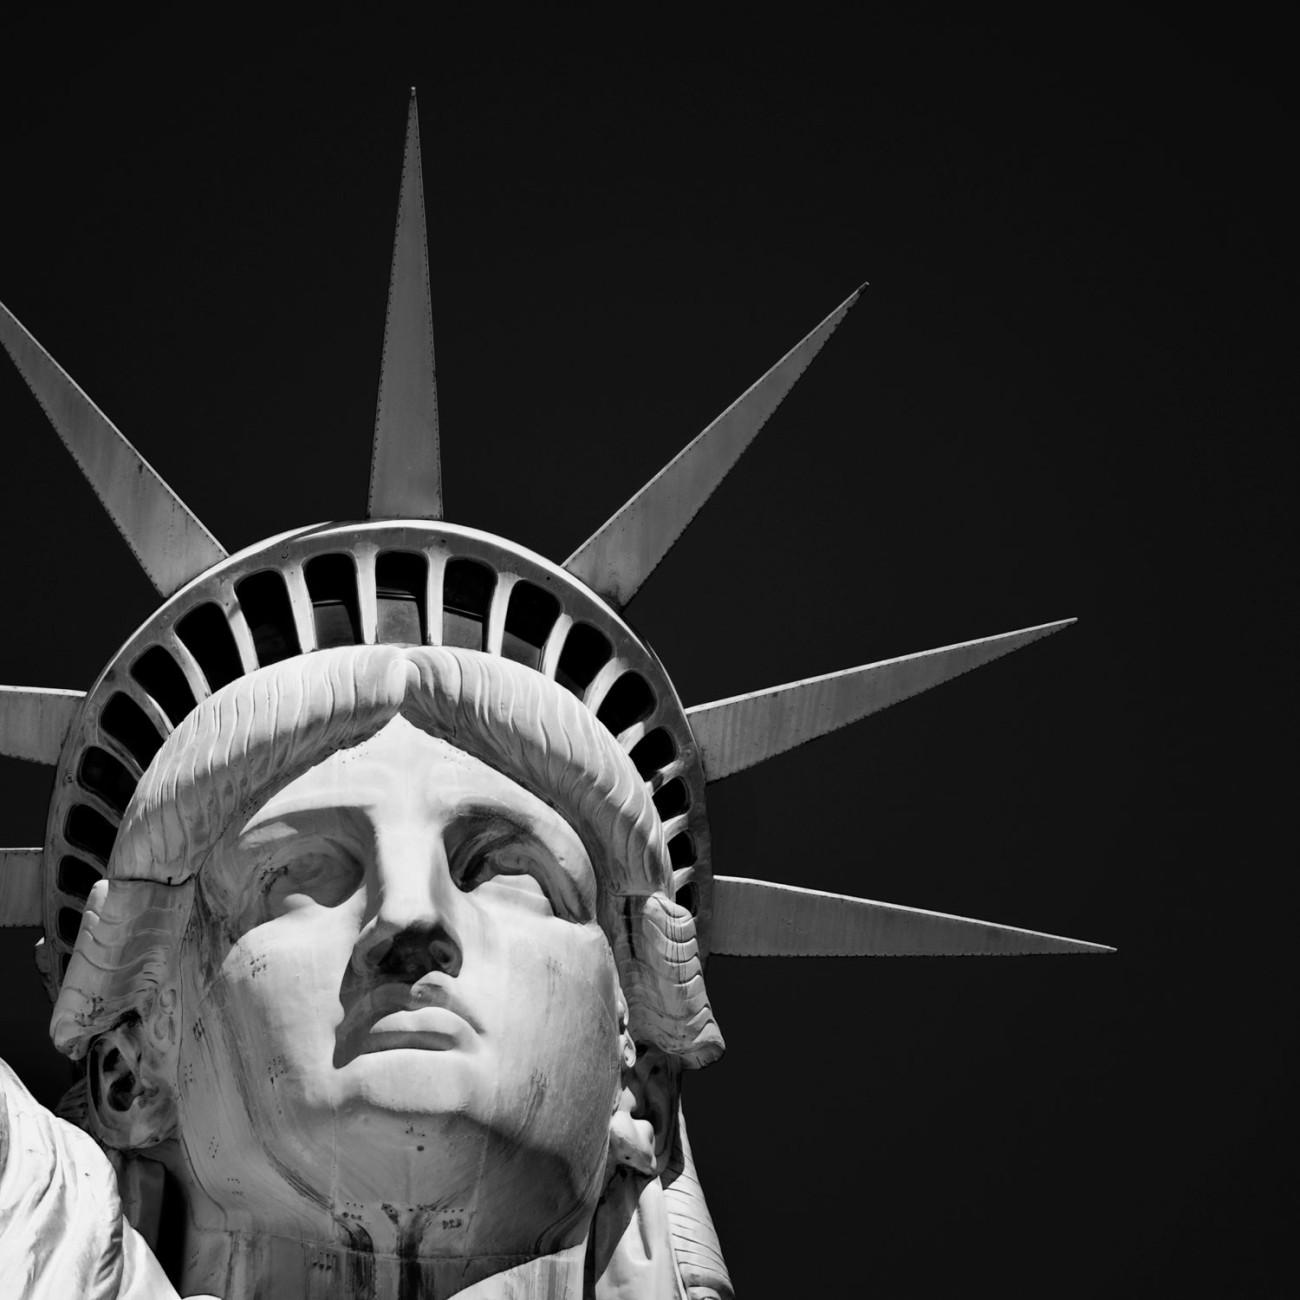 Monument to Liberty, study I, New York, 2009